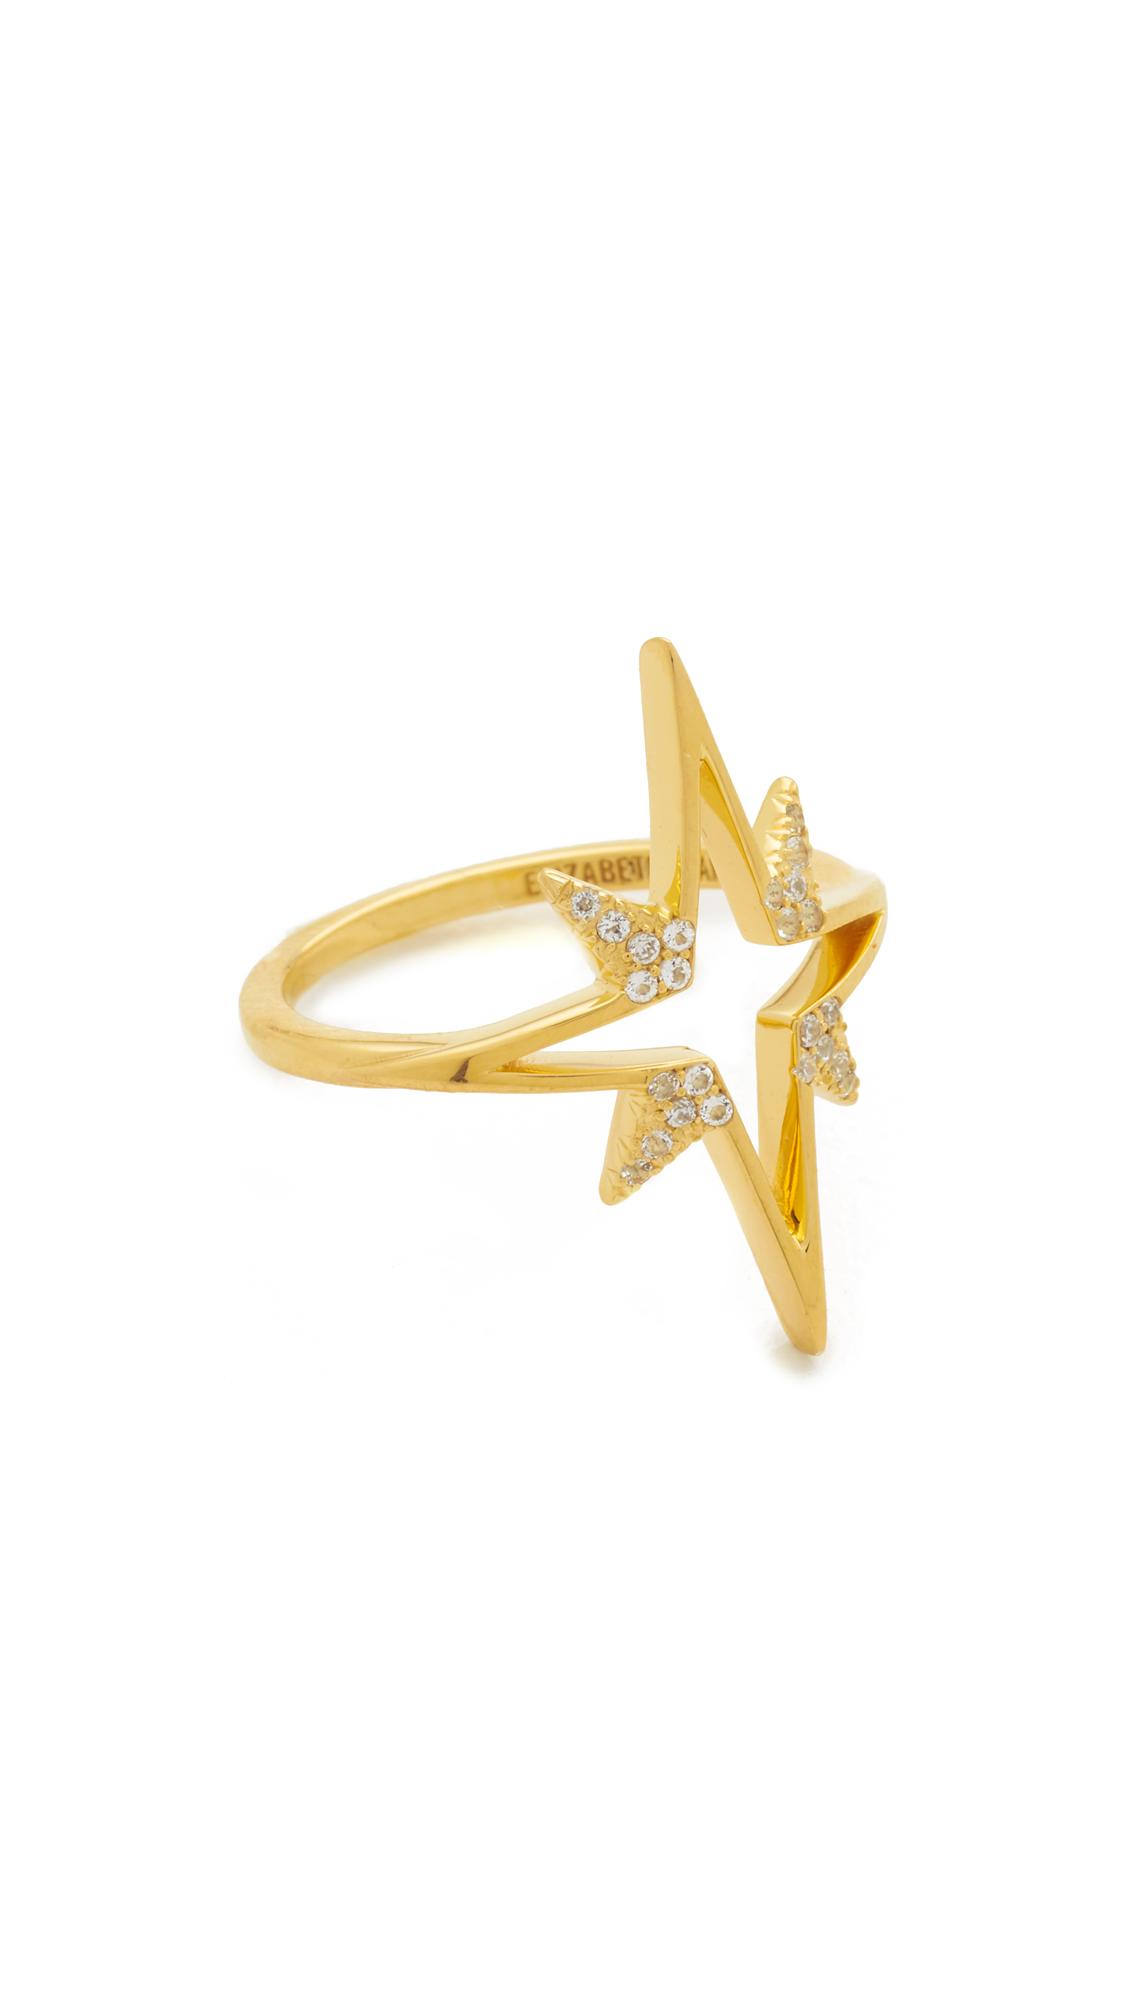 Elizabeth and James Astral Ring - Gold